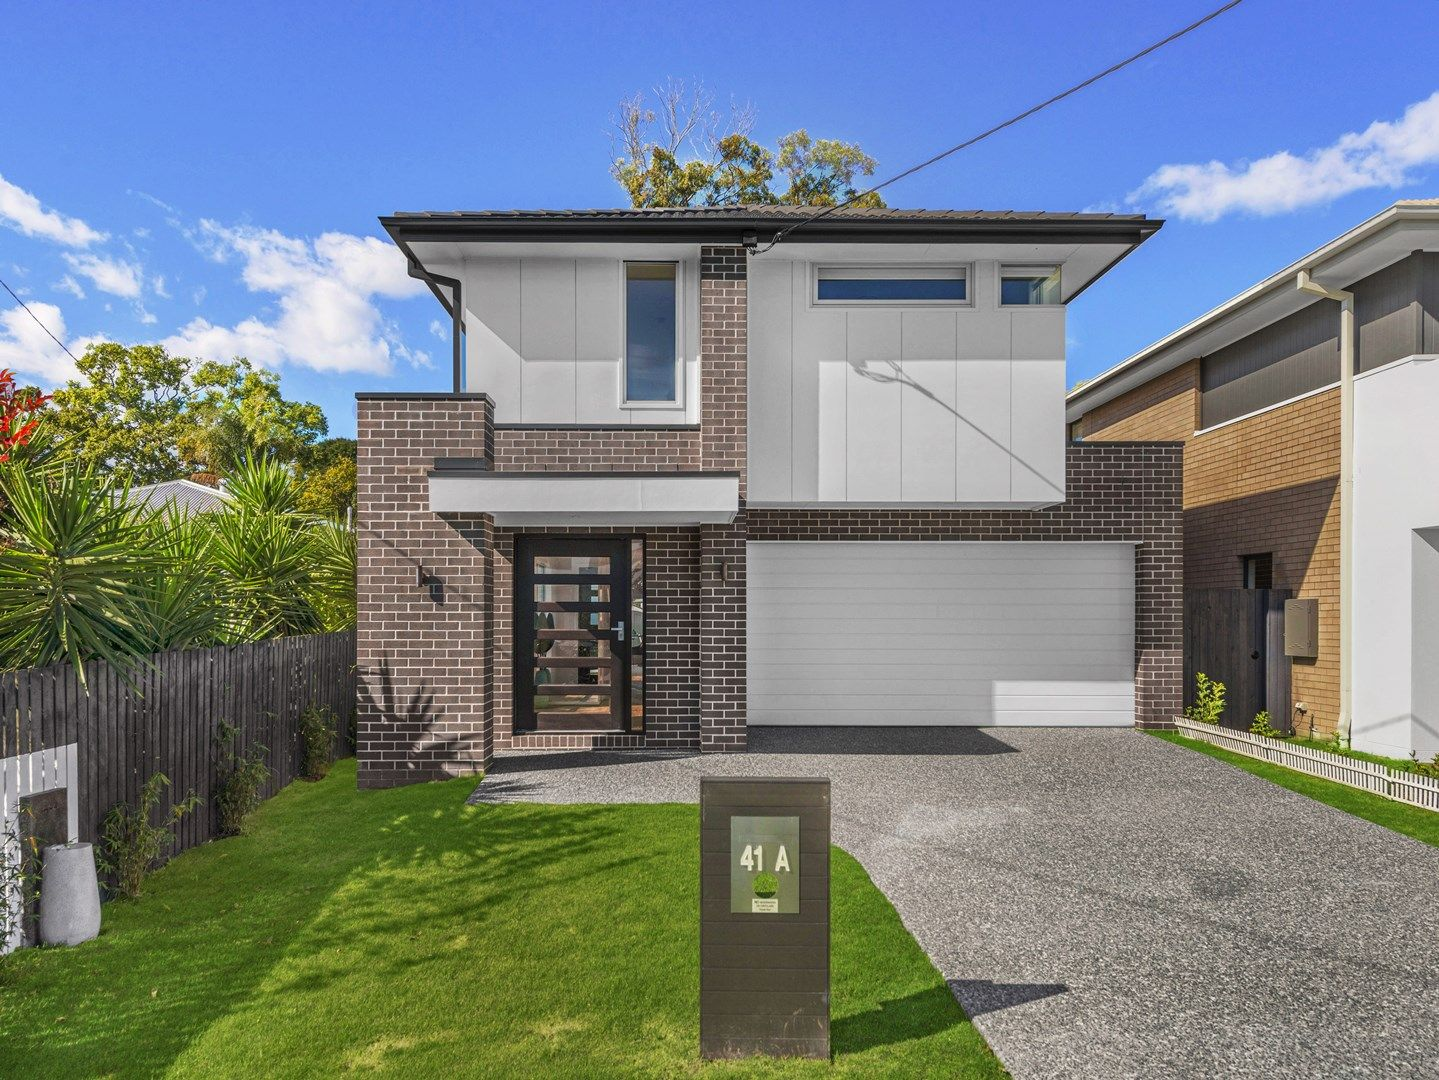 41A Avon Street, Morningside QLD 4170, Image 0